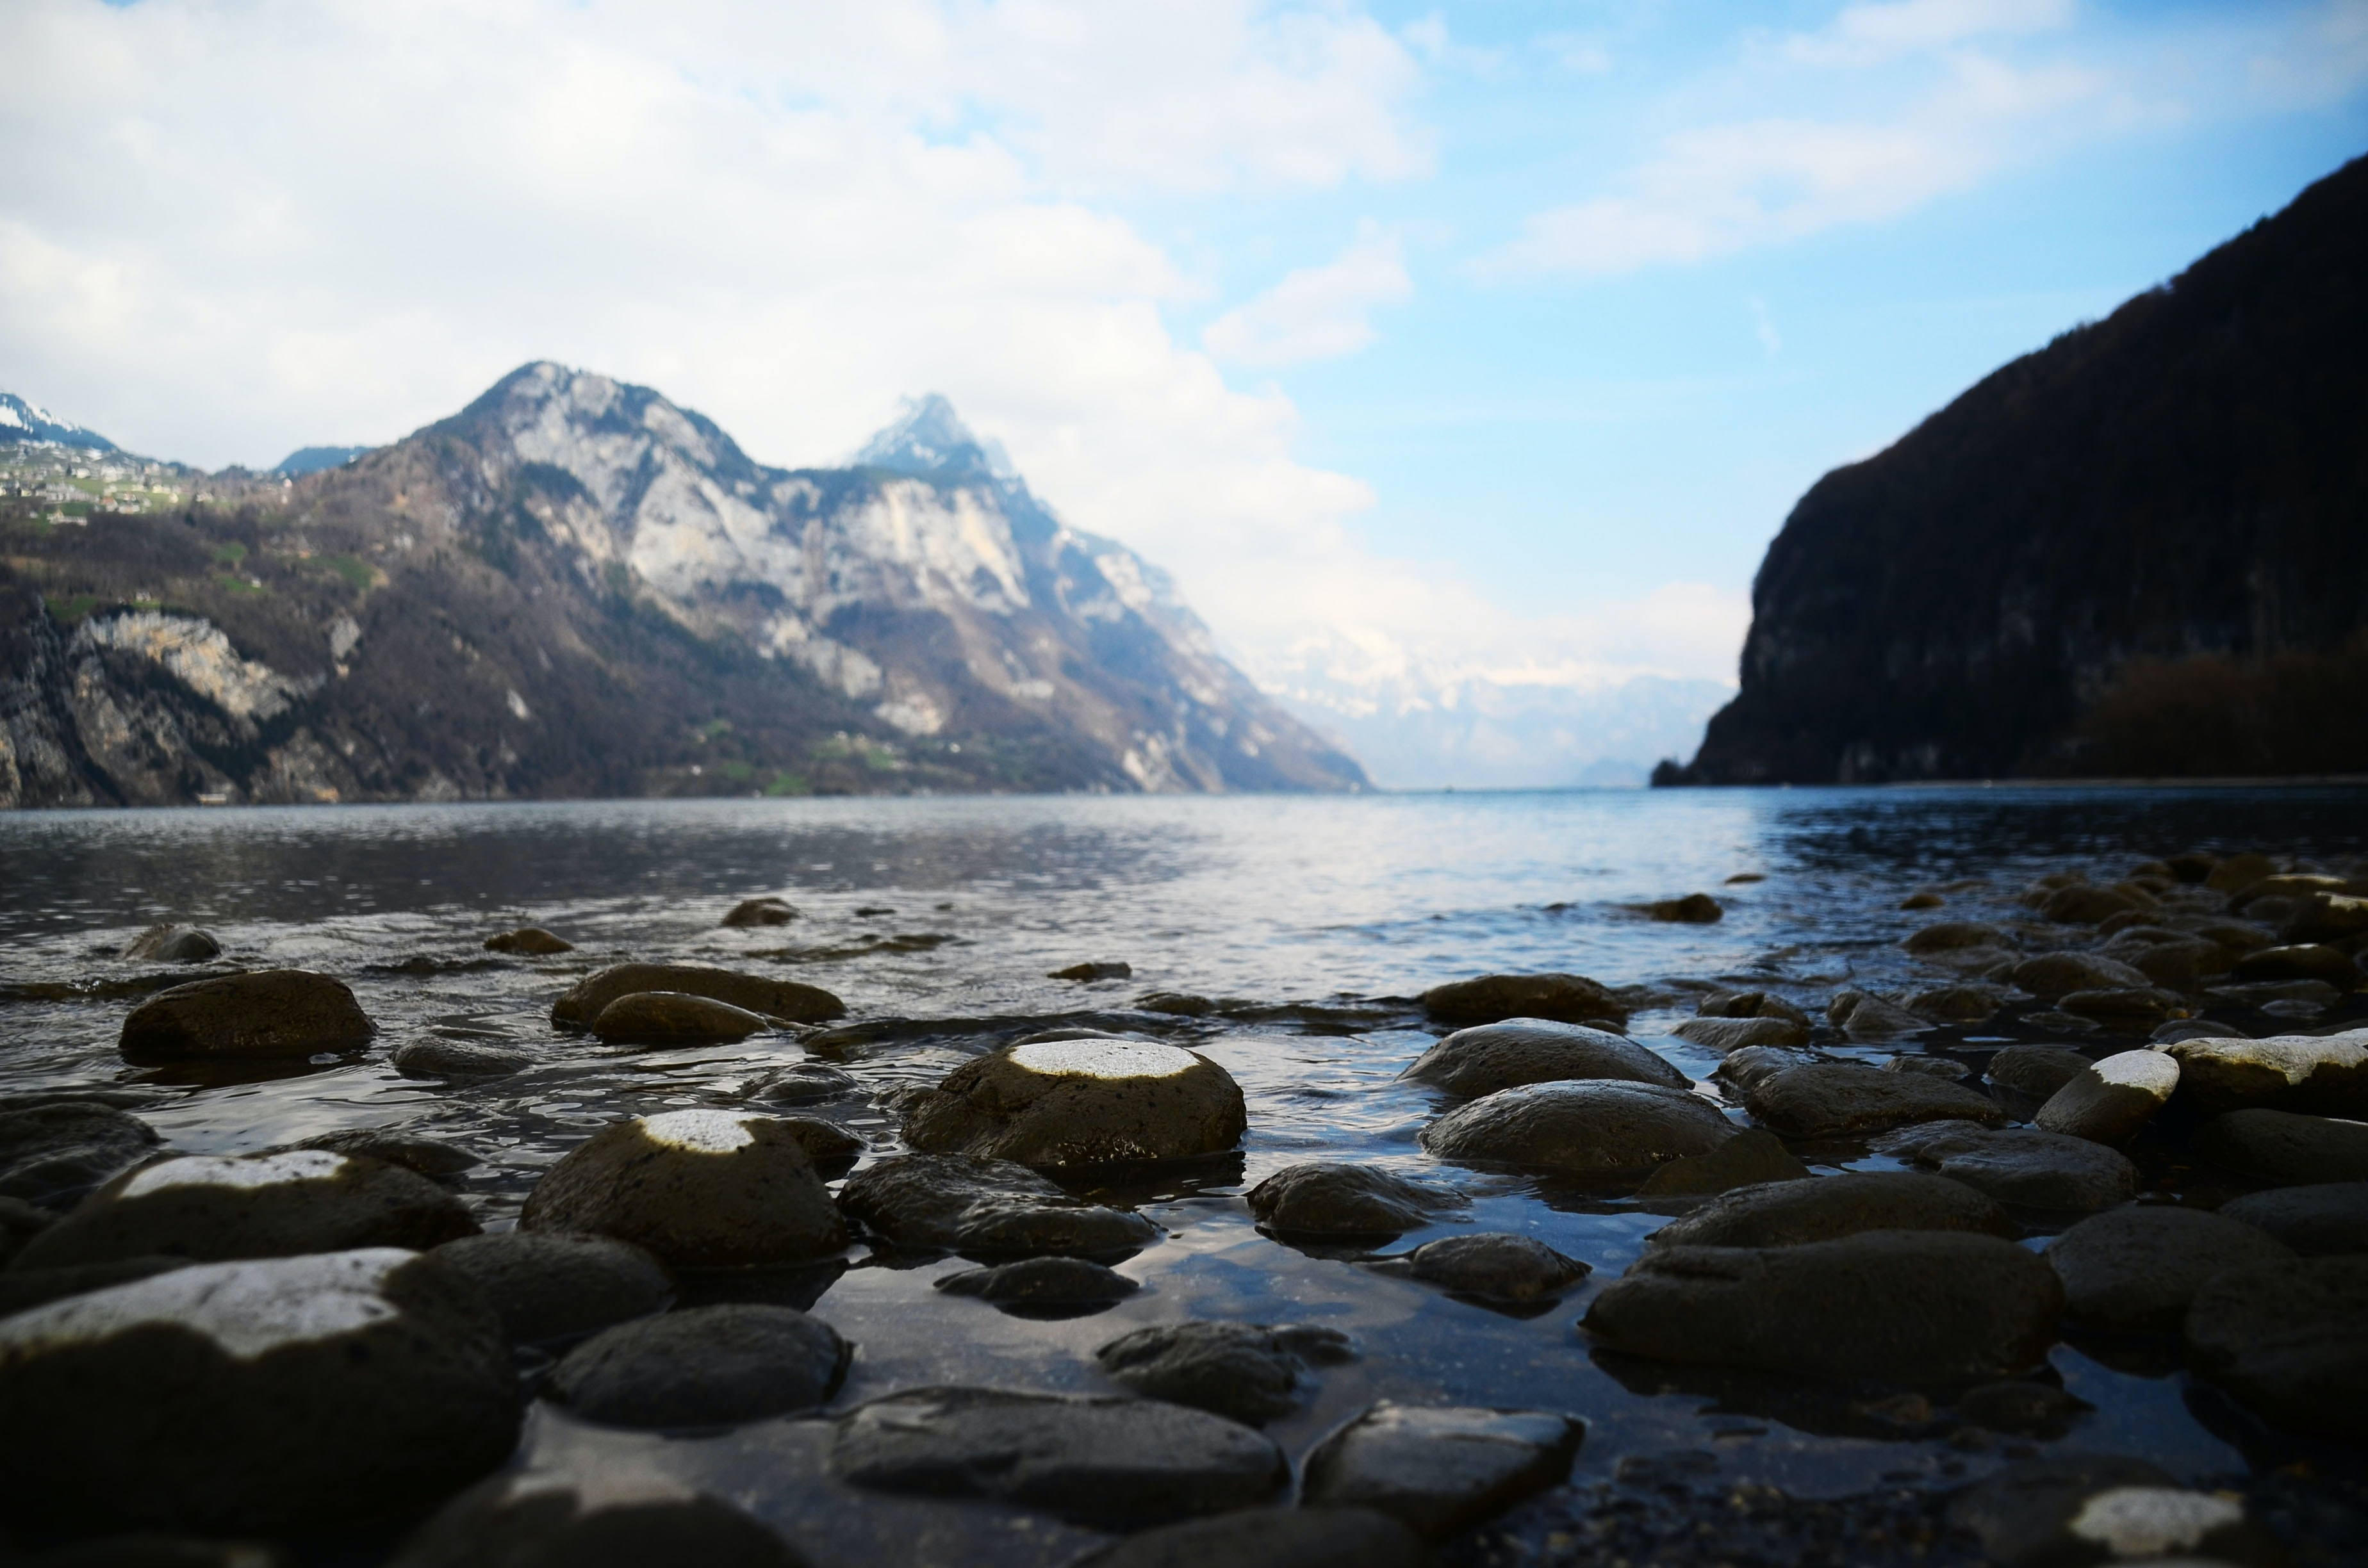 Glossy rocks in a serene mountain lake